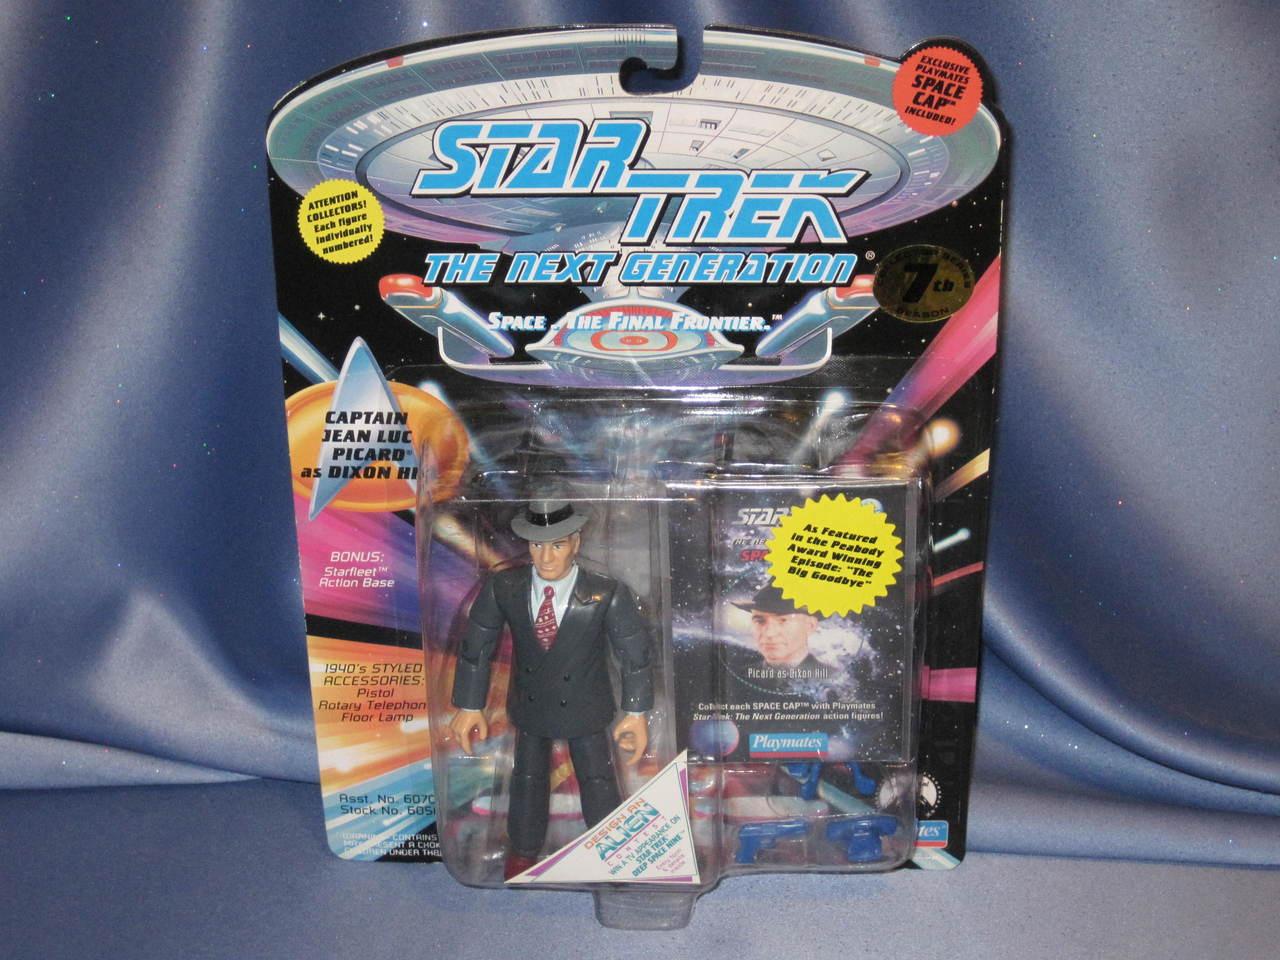 Star Trek The Next Generation Capt. Jean Luc Picard as